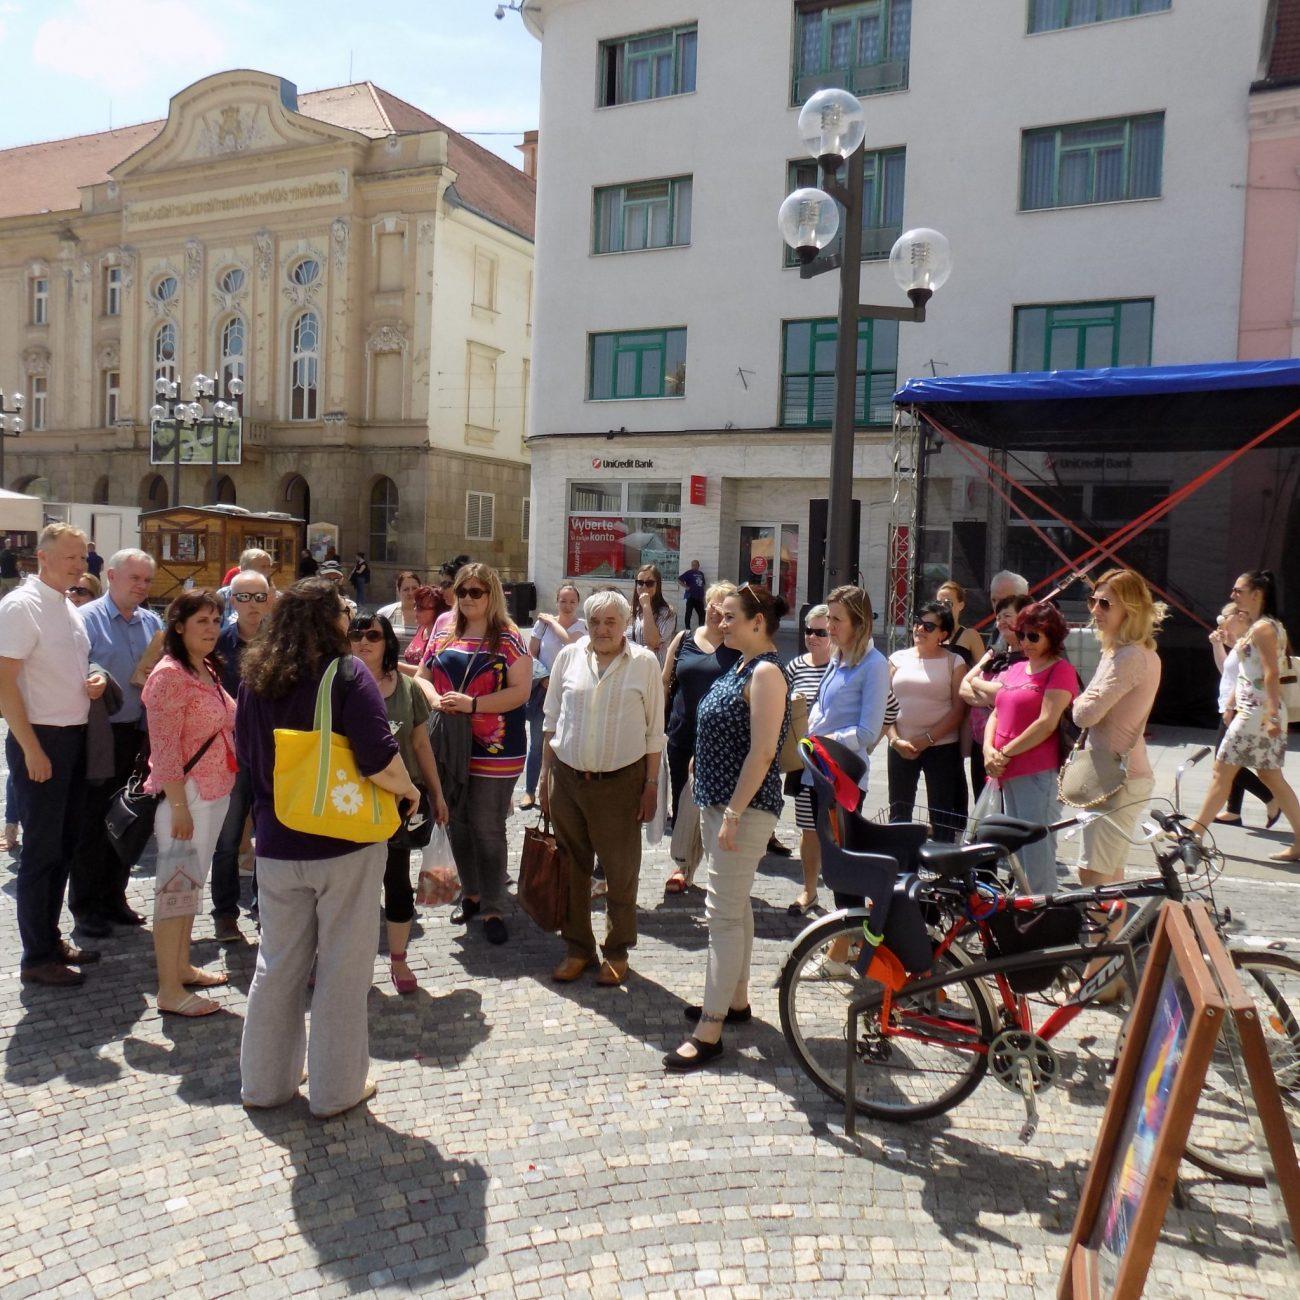 Predstavili sme Trnavu, partnerské mesto projektu